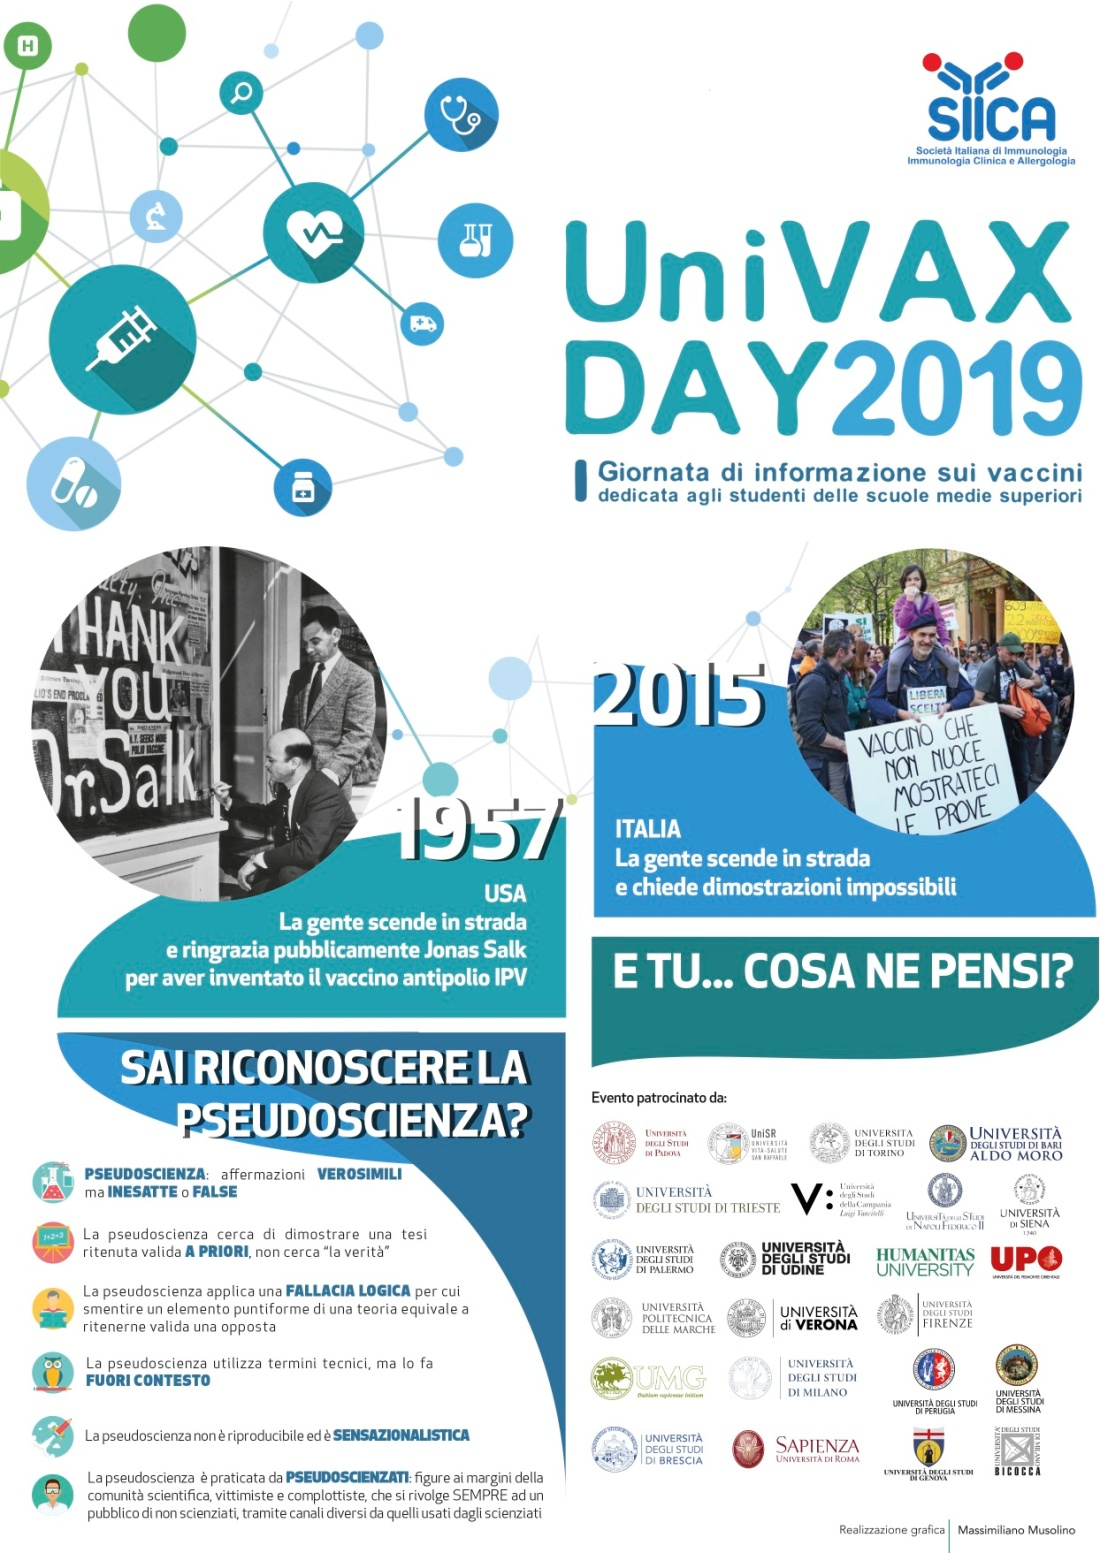 univax 2019 1a